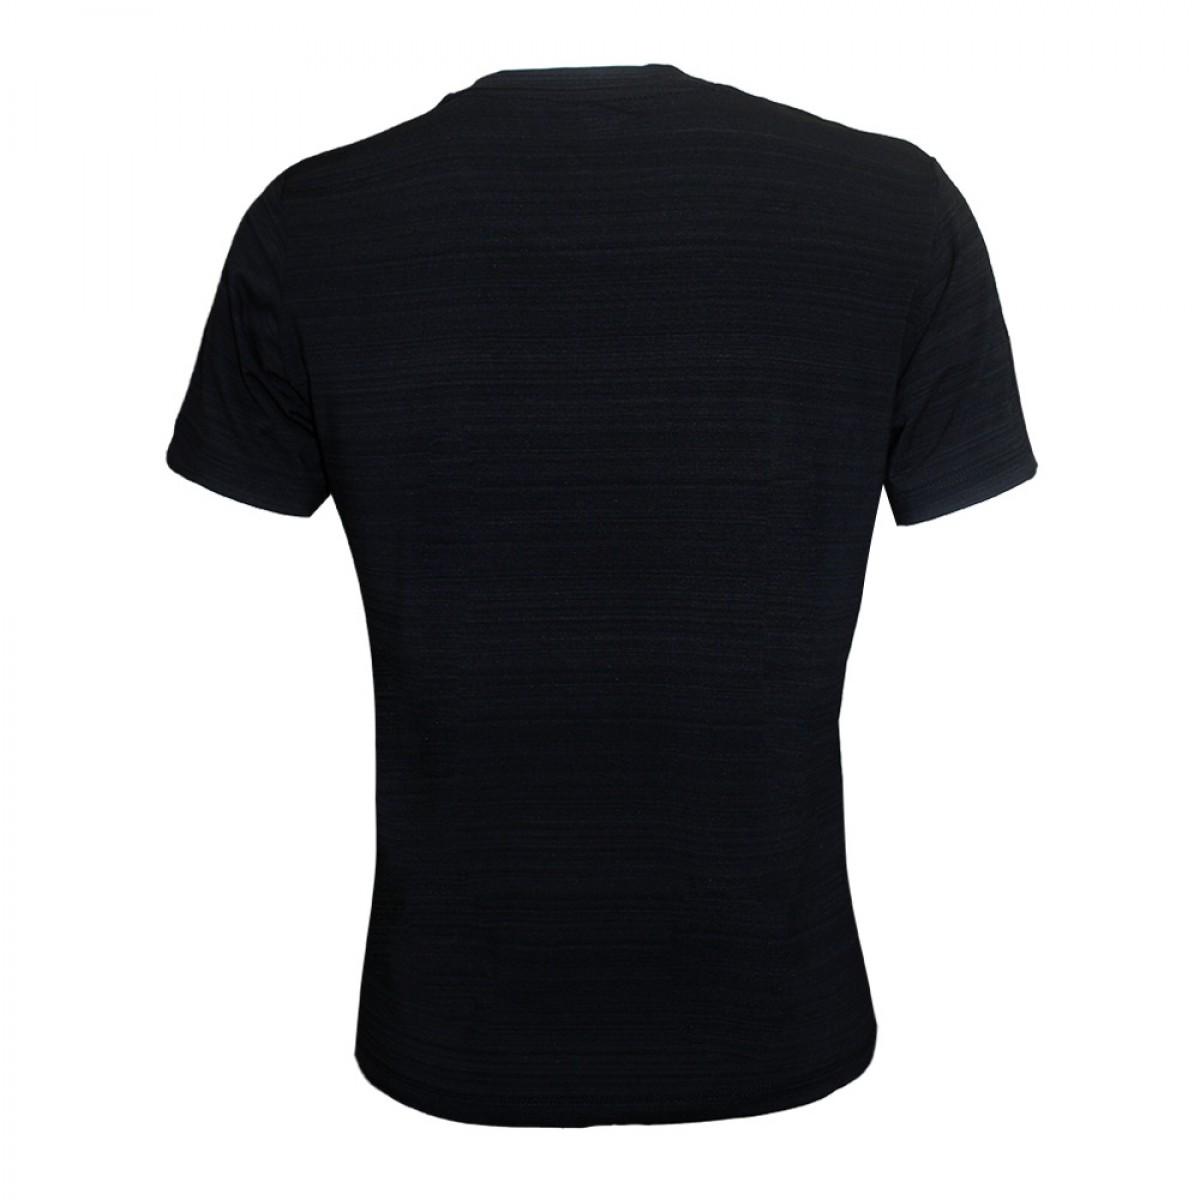 women-round-neck-t-shirt-krt06863-8a